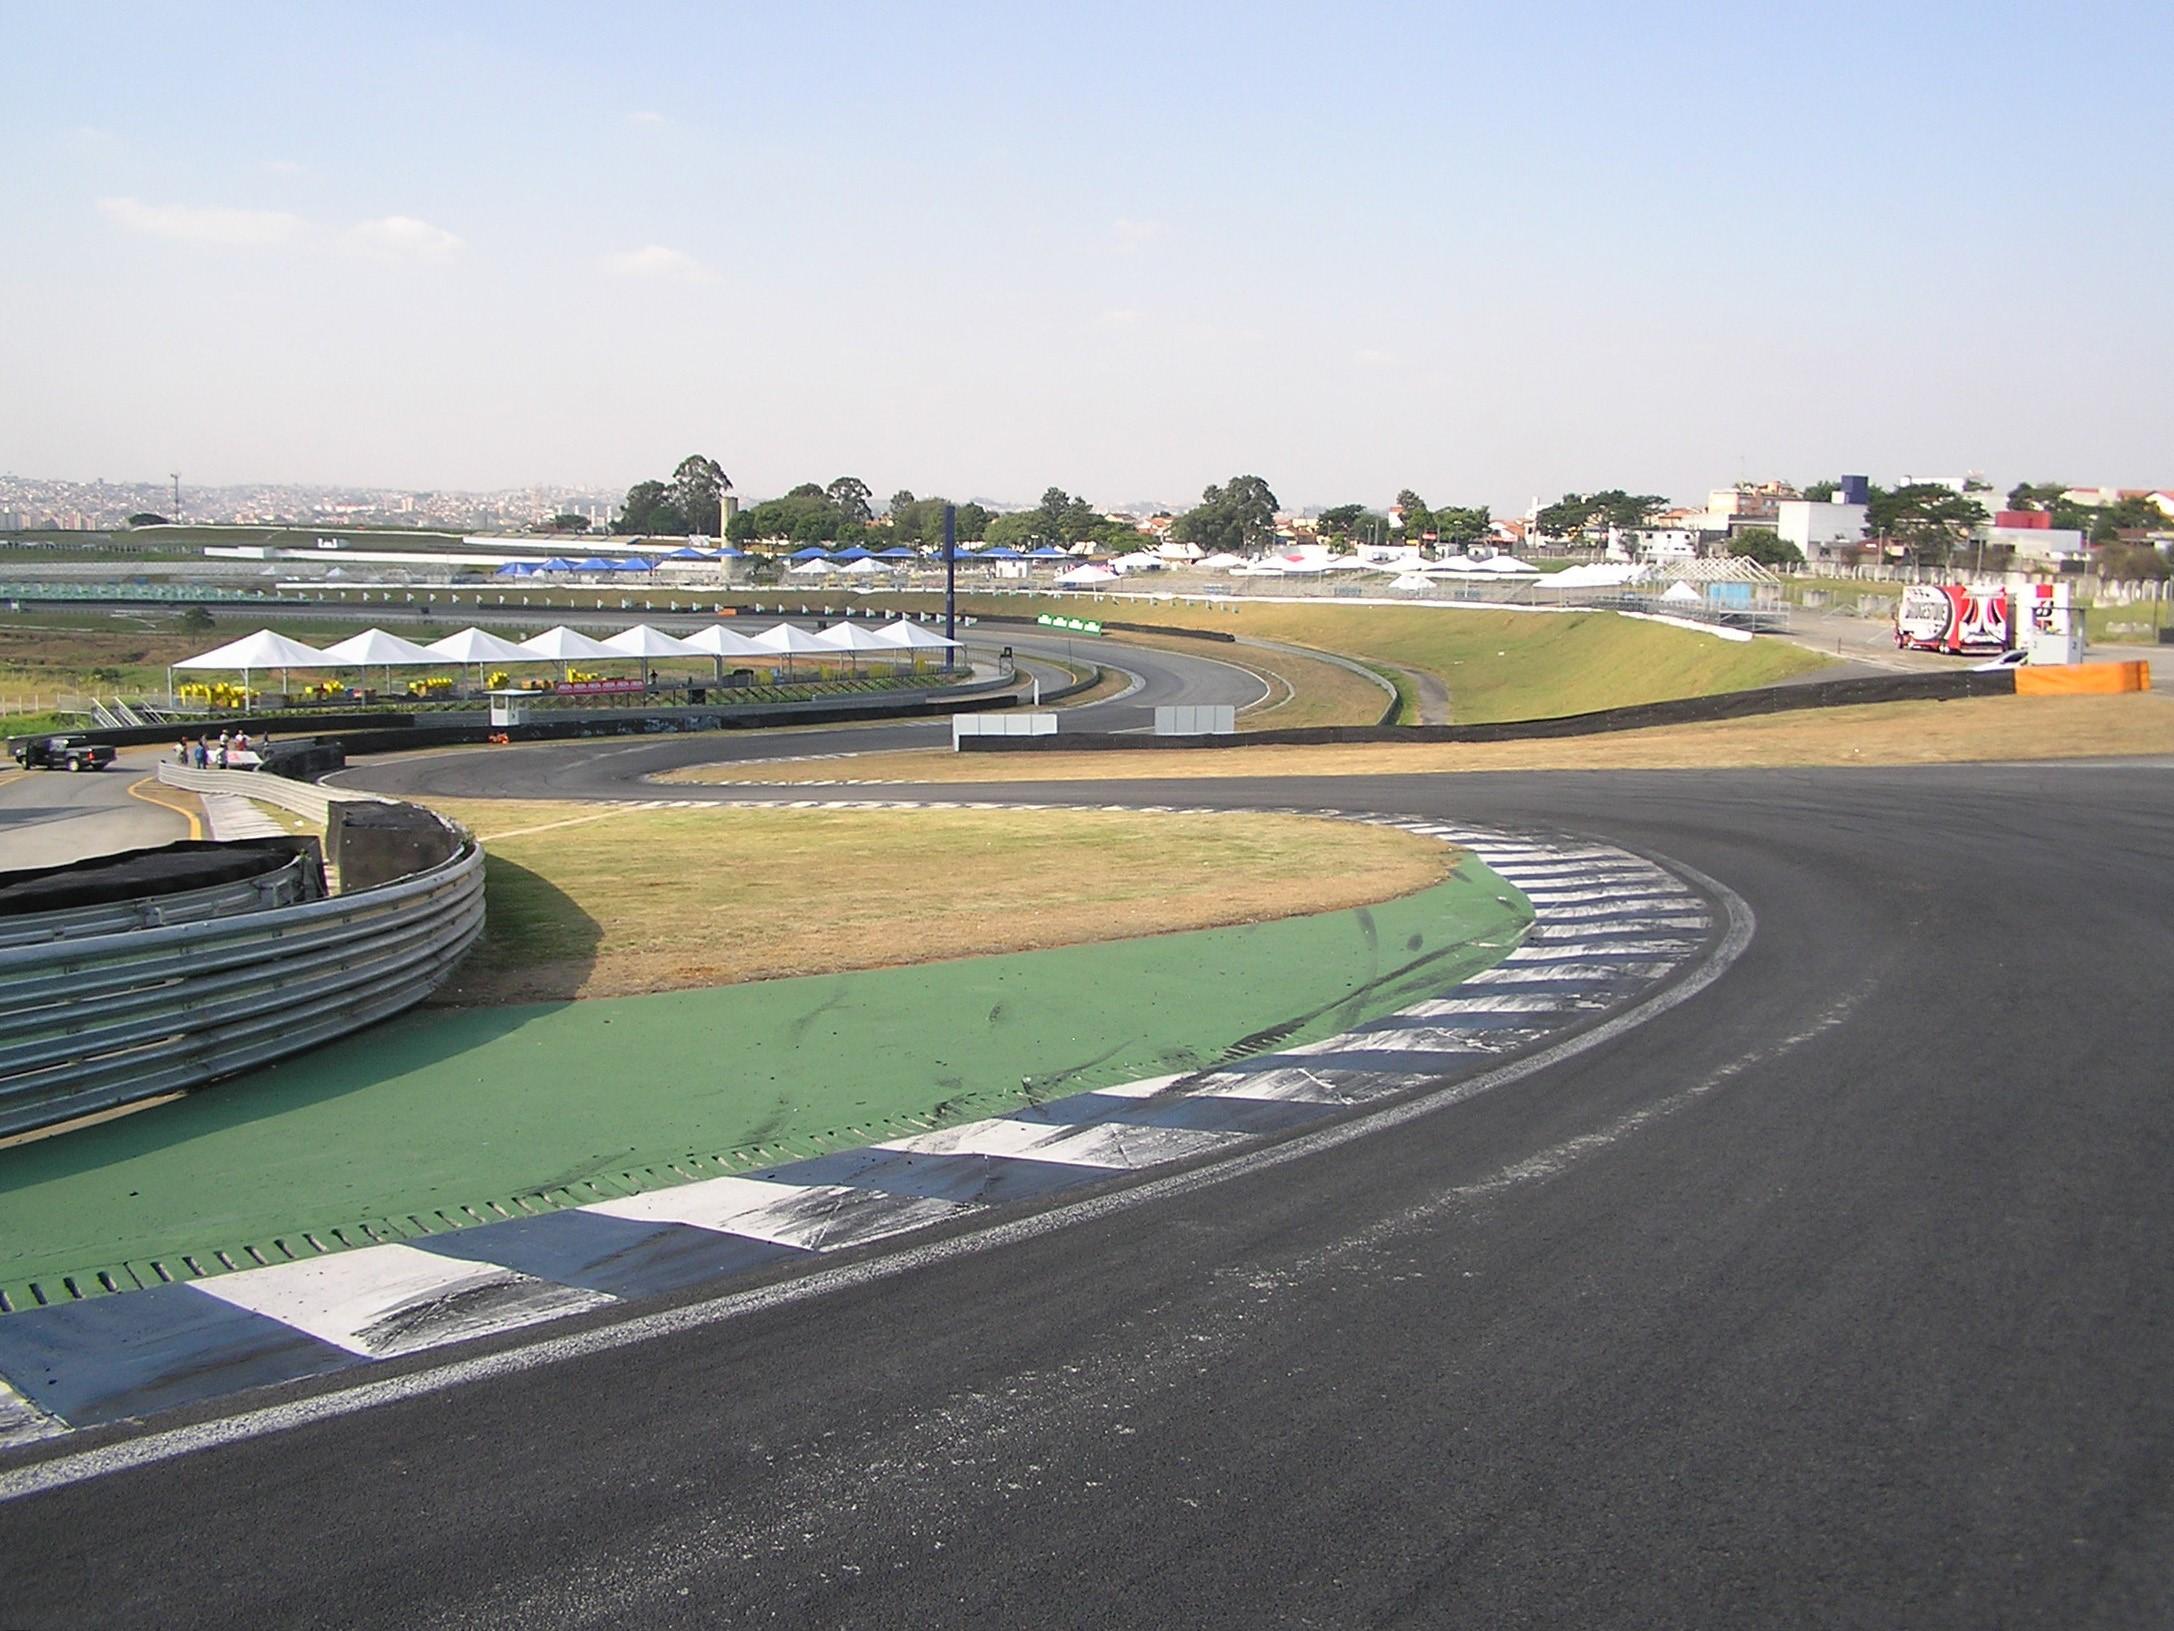 http://superf1.be/spip/IMG/jpg/autodromo_jose_carlos_pace_s_do_senna.jpg